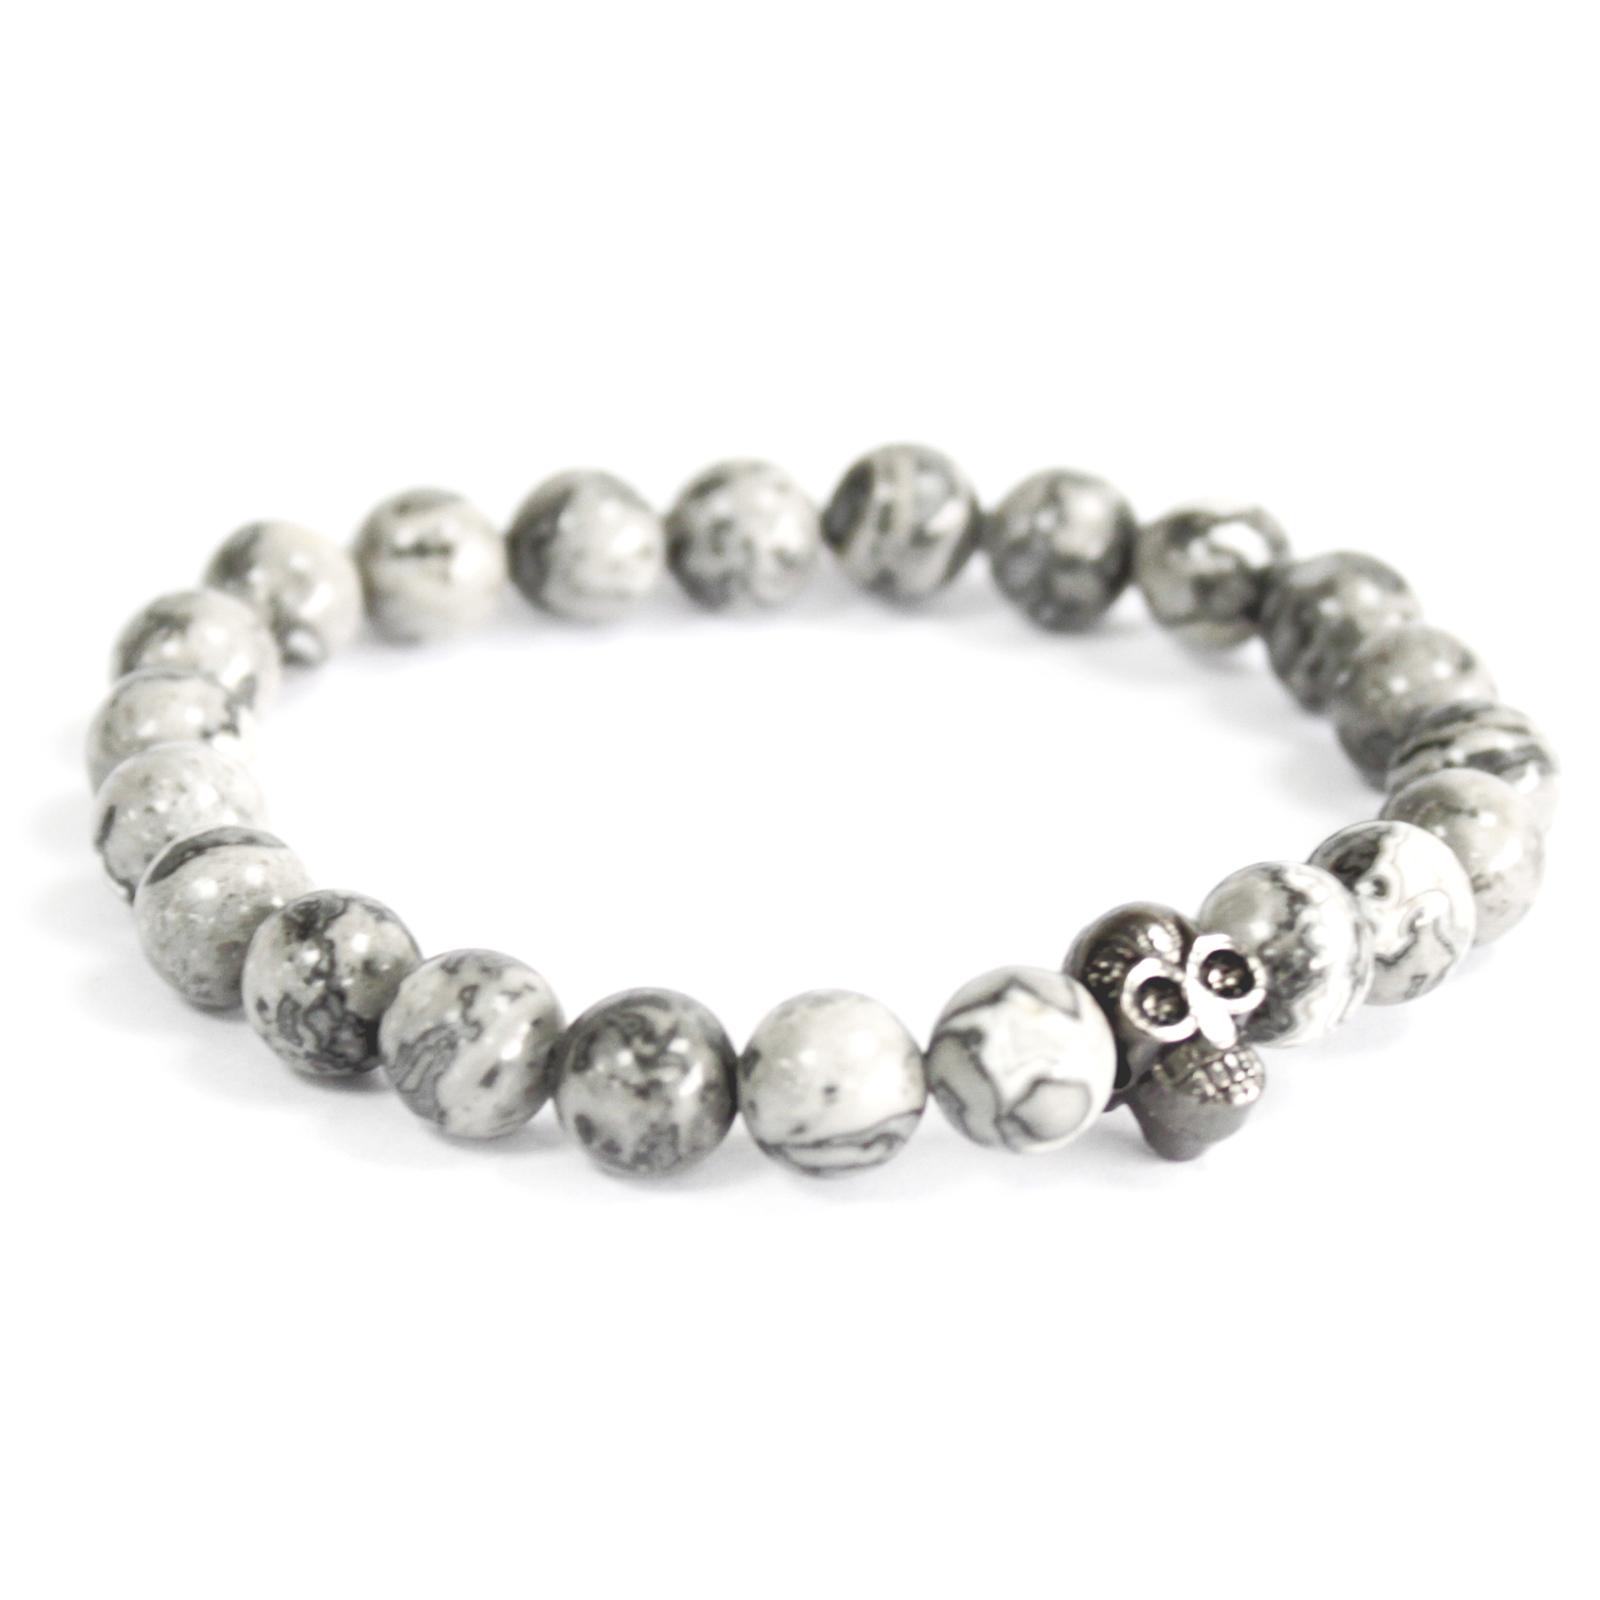 3x Pewter Skull / Grey Agate - Gemstone Bracelet